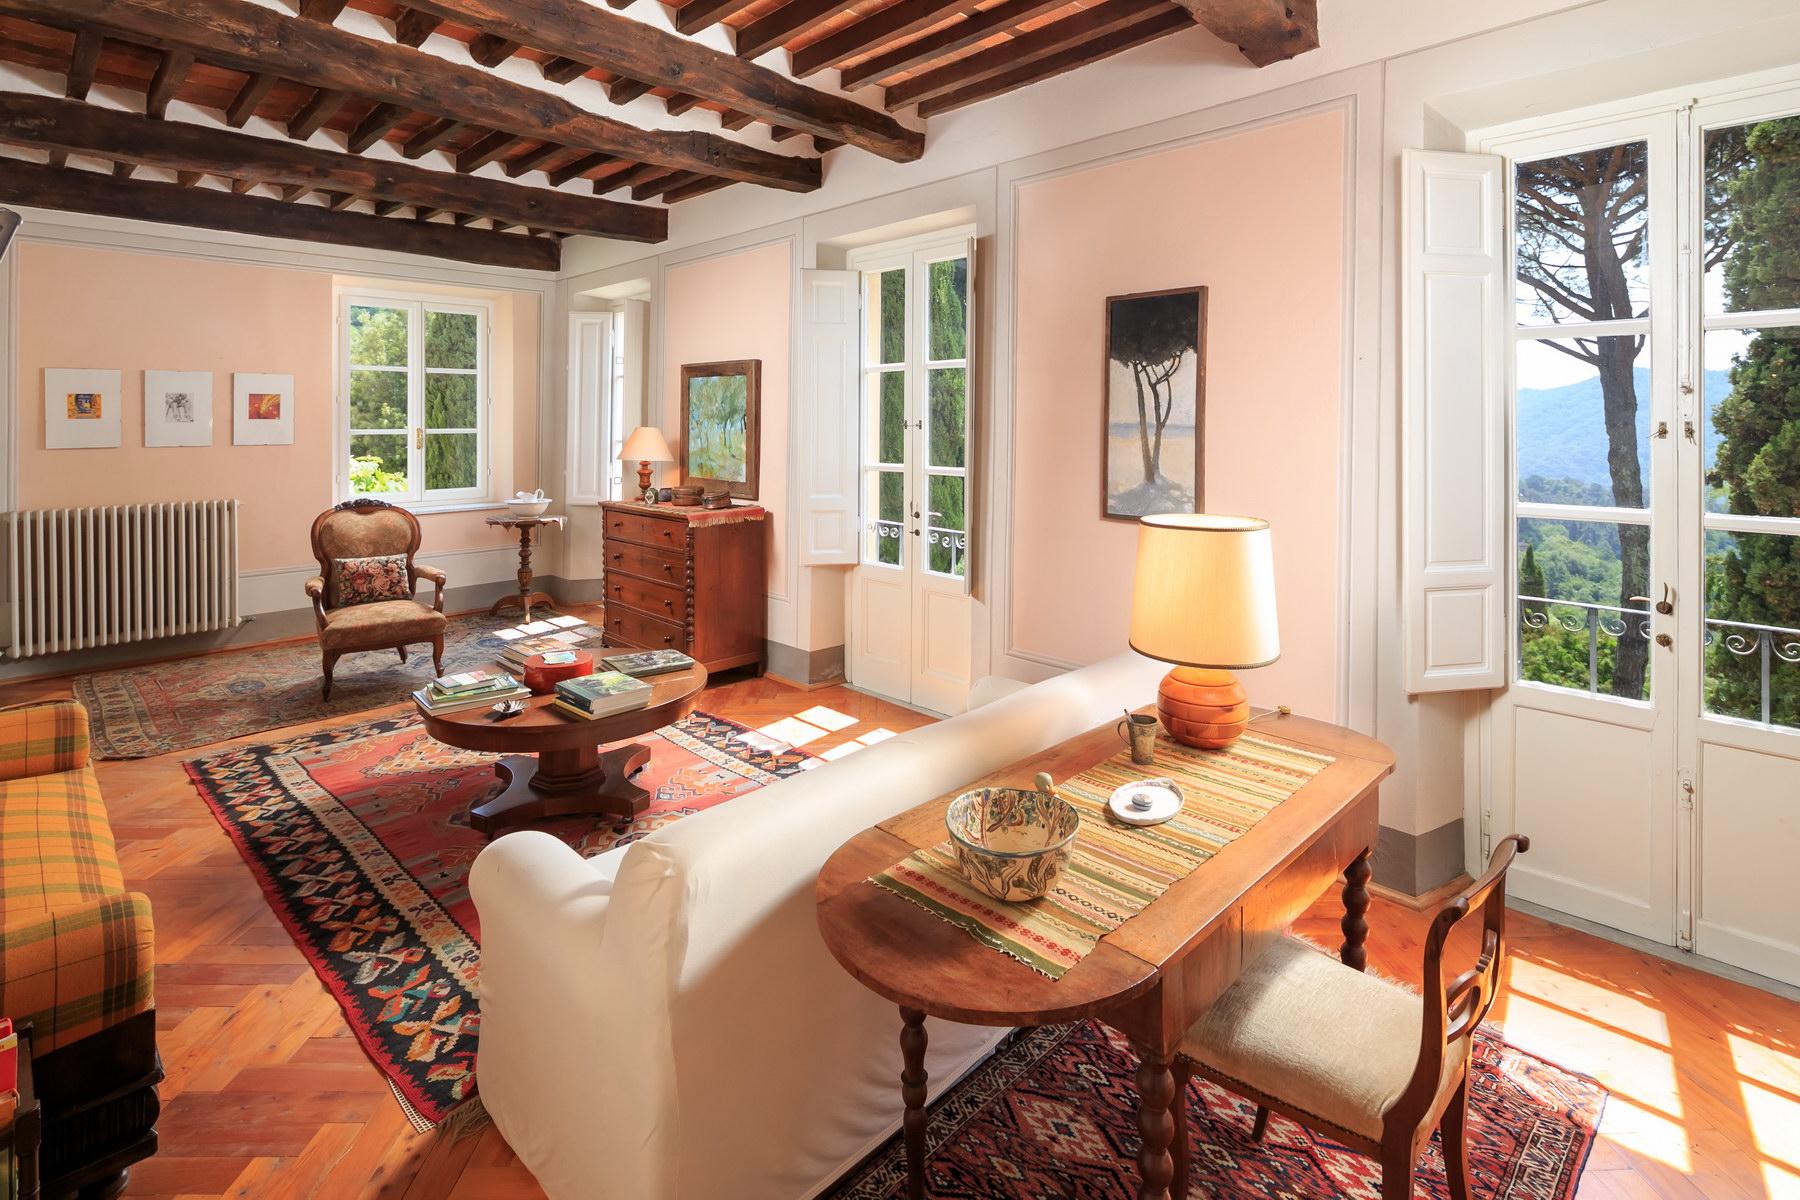 Villa in Vendita a Lucca: 5 locali, 1500 mq - Foto 7